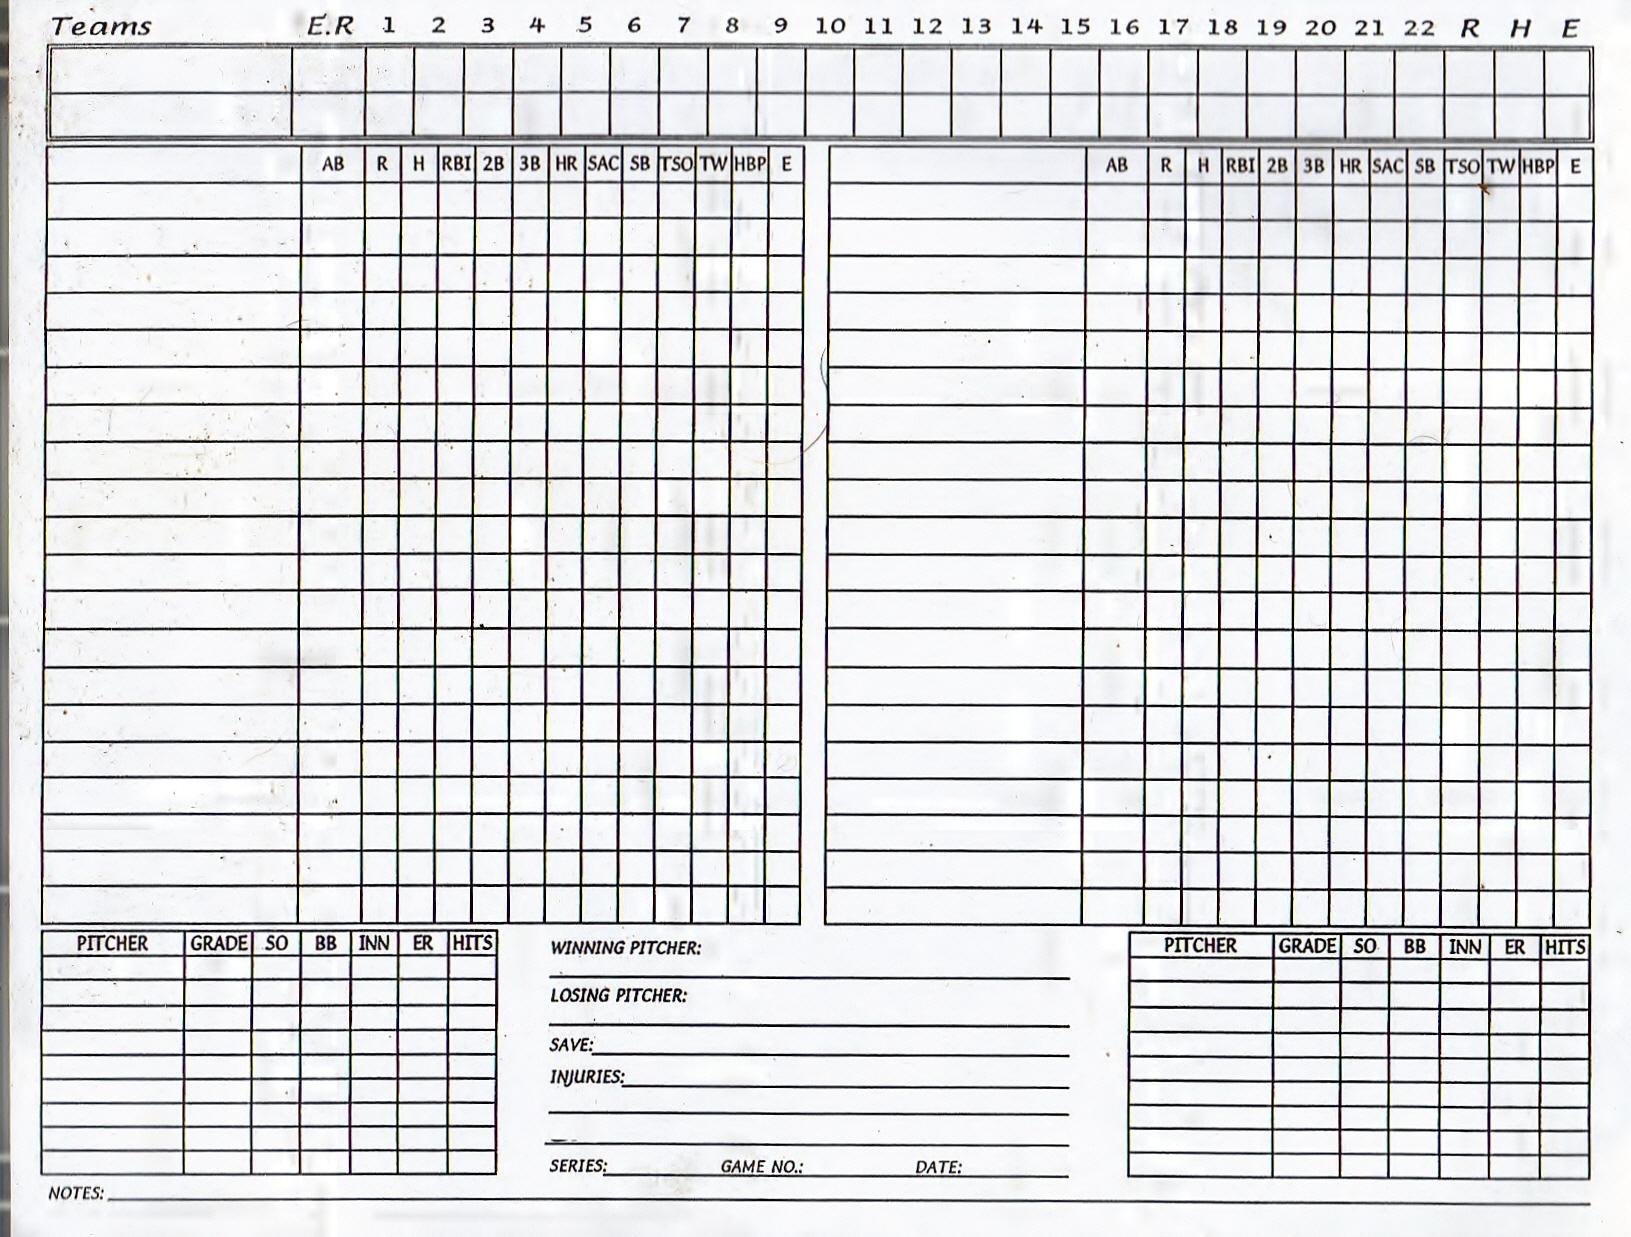 Zangari's South APBA Baseball League